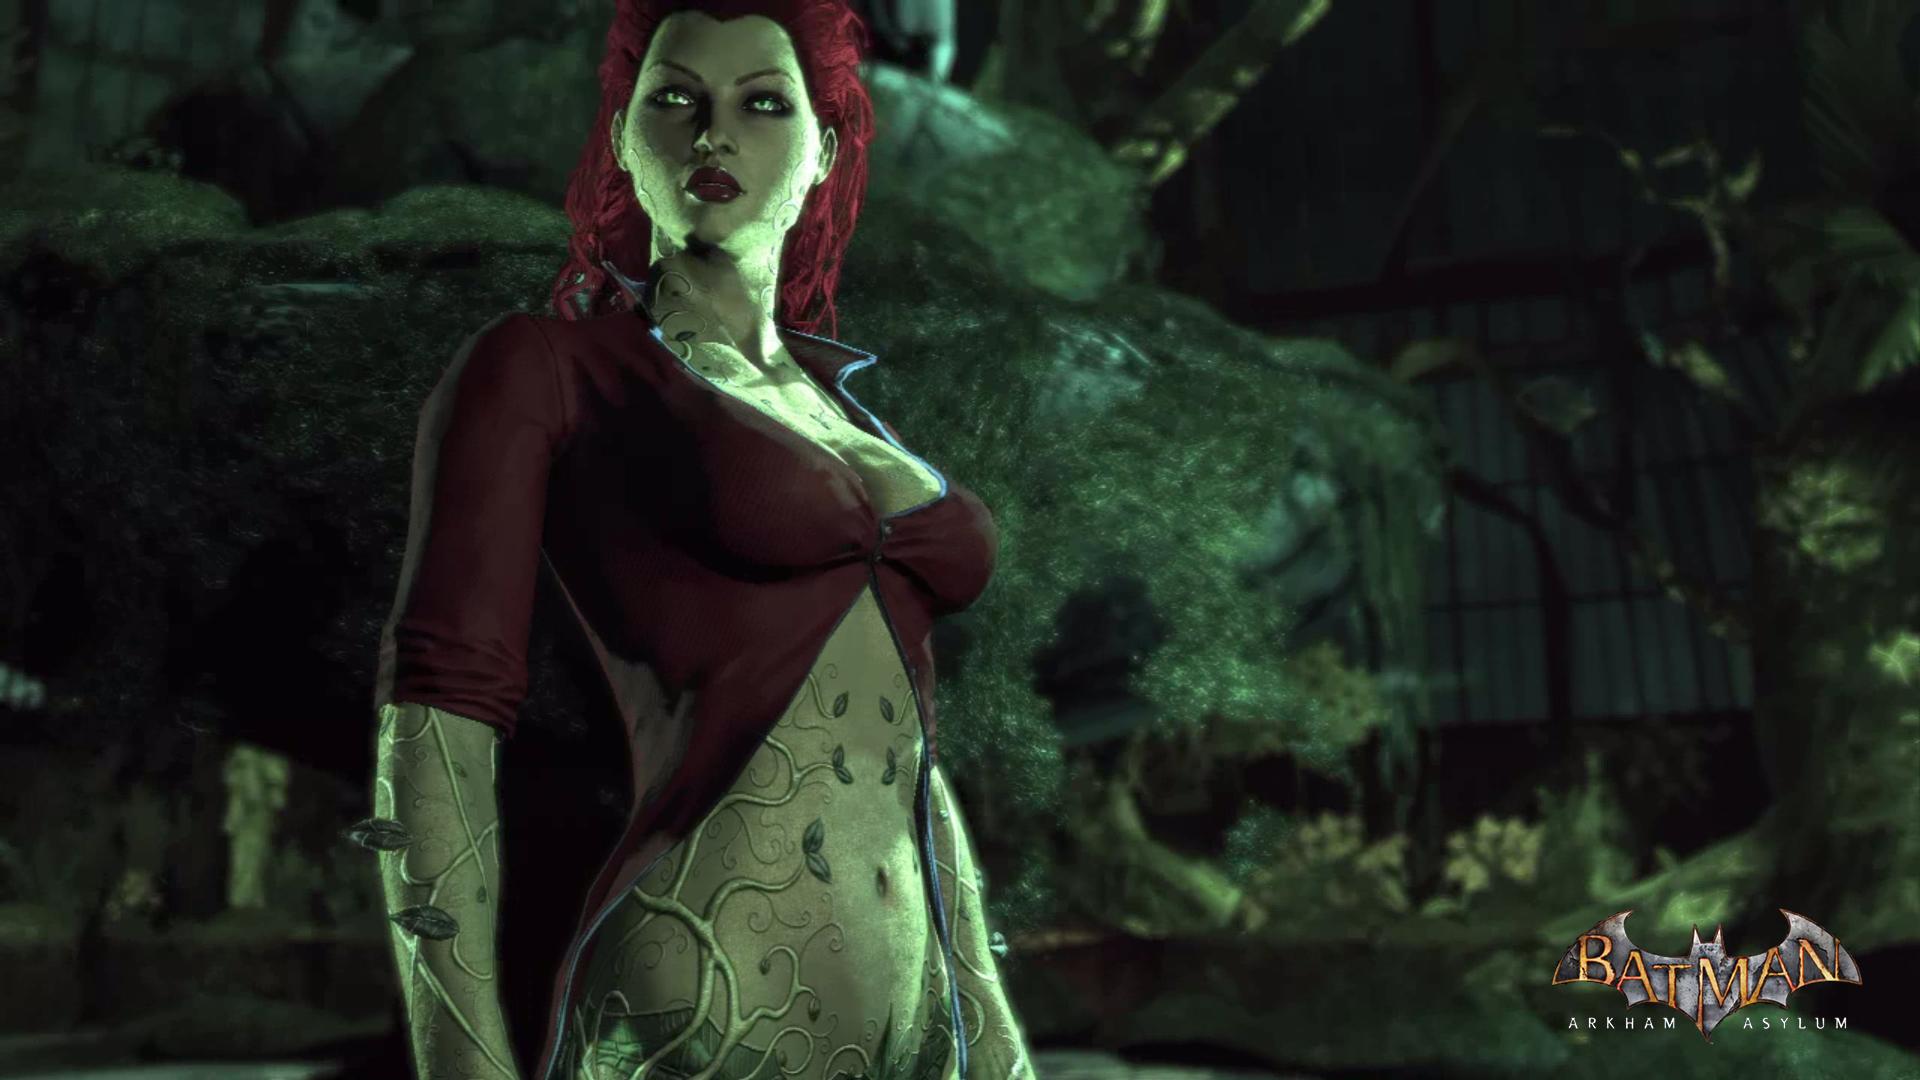 Wallpaper Batman Arkham Asylum Poison Ivy Video Games